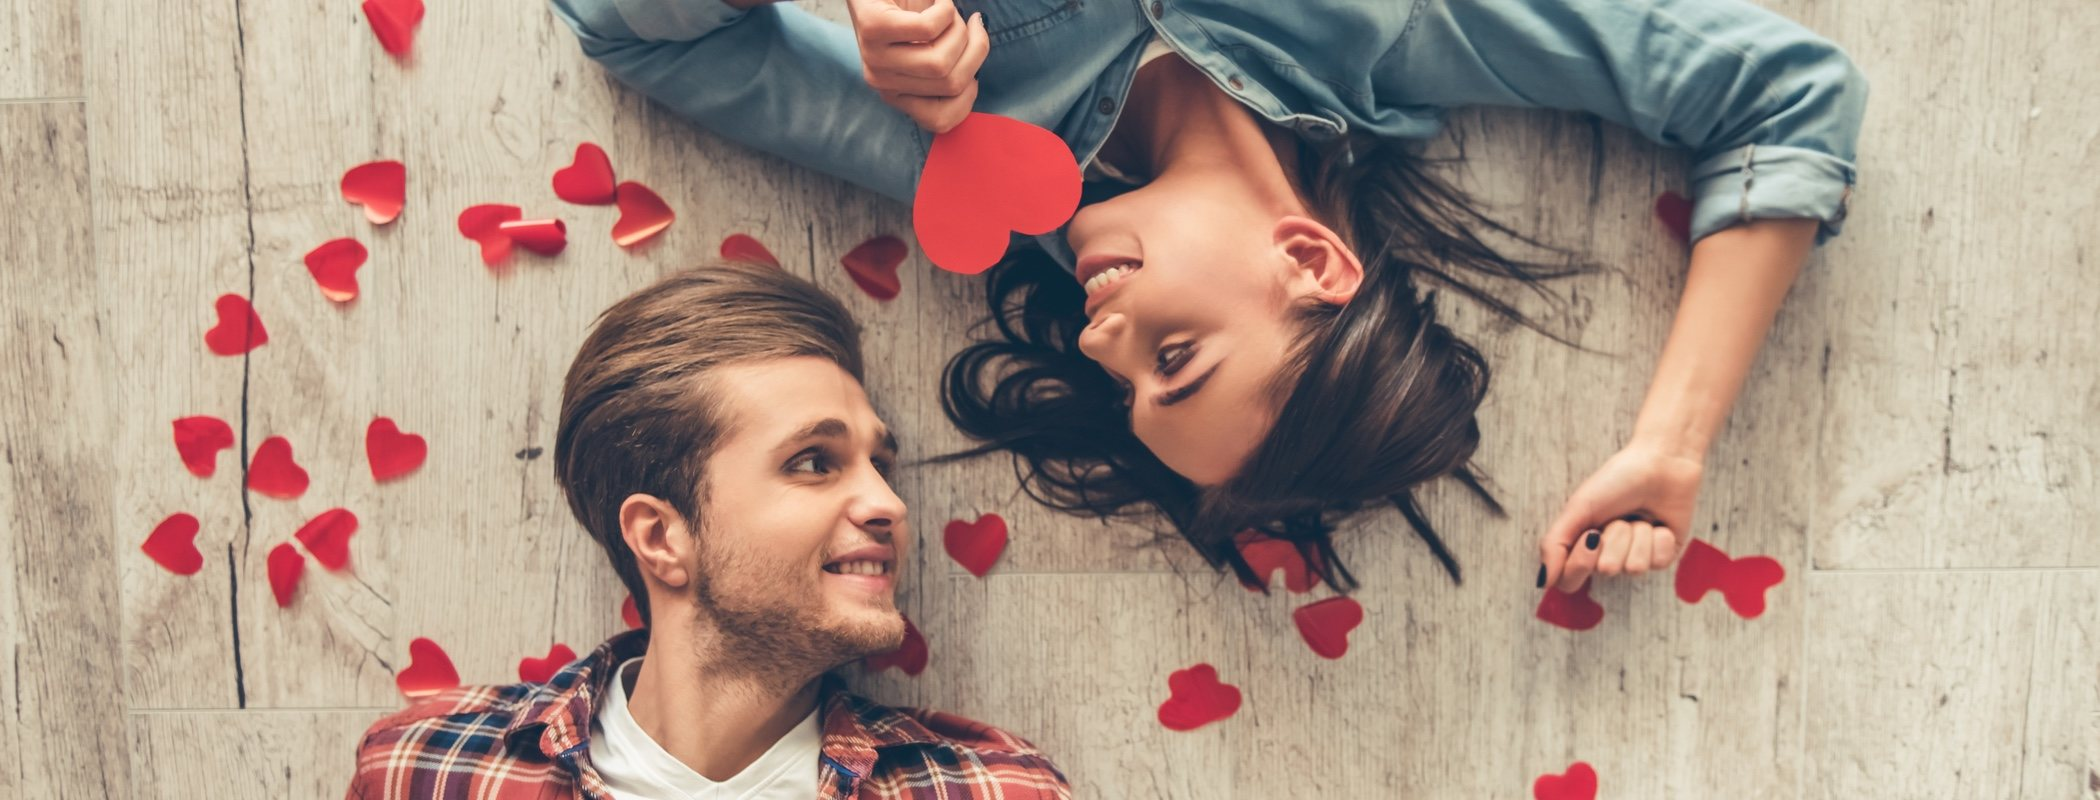 San Valentín en distintos países: así se celebra